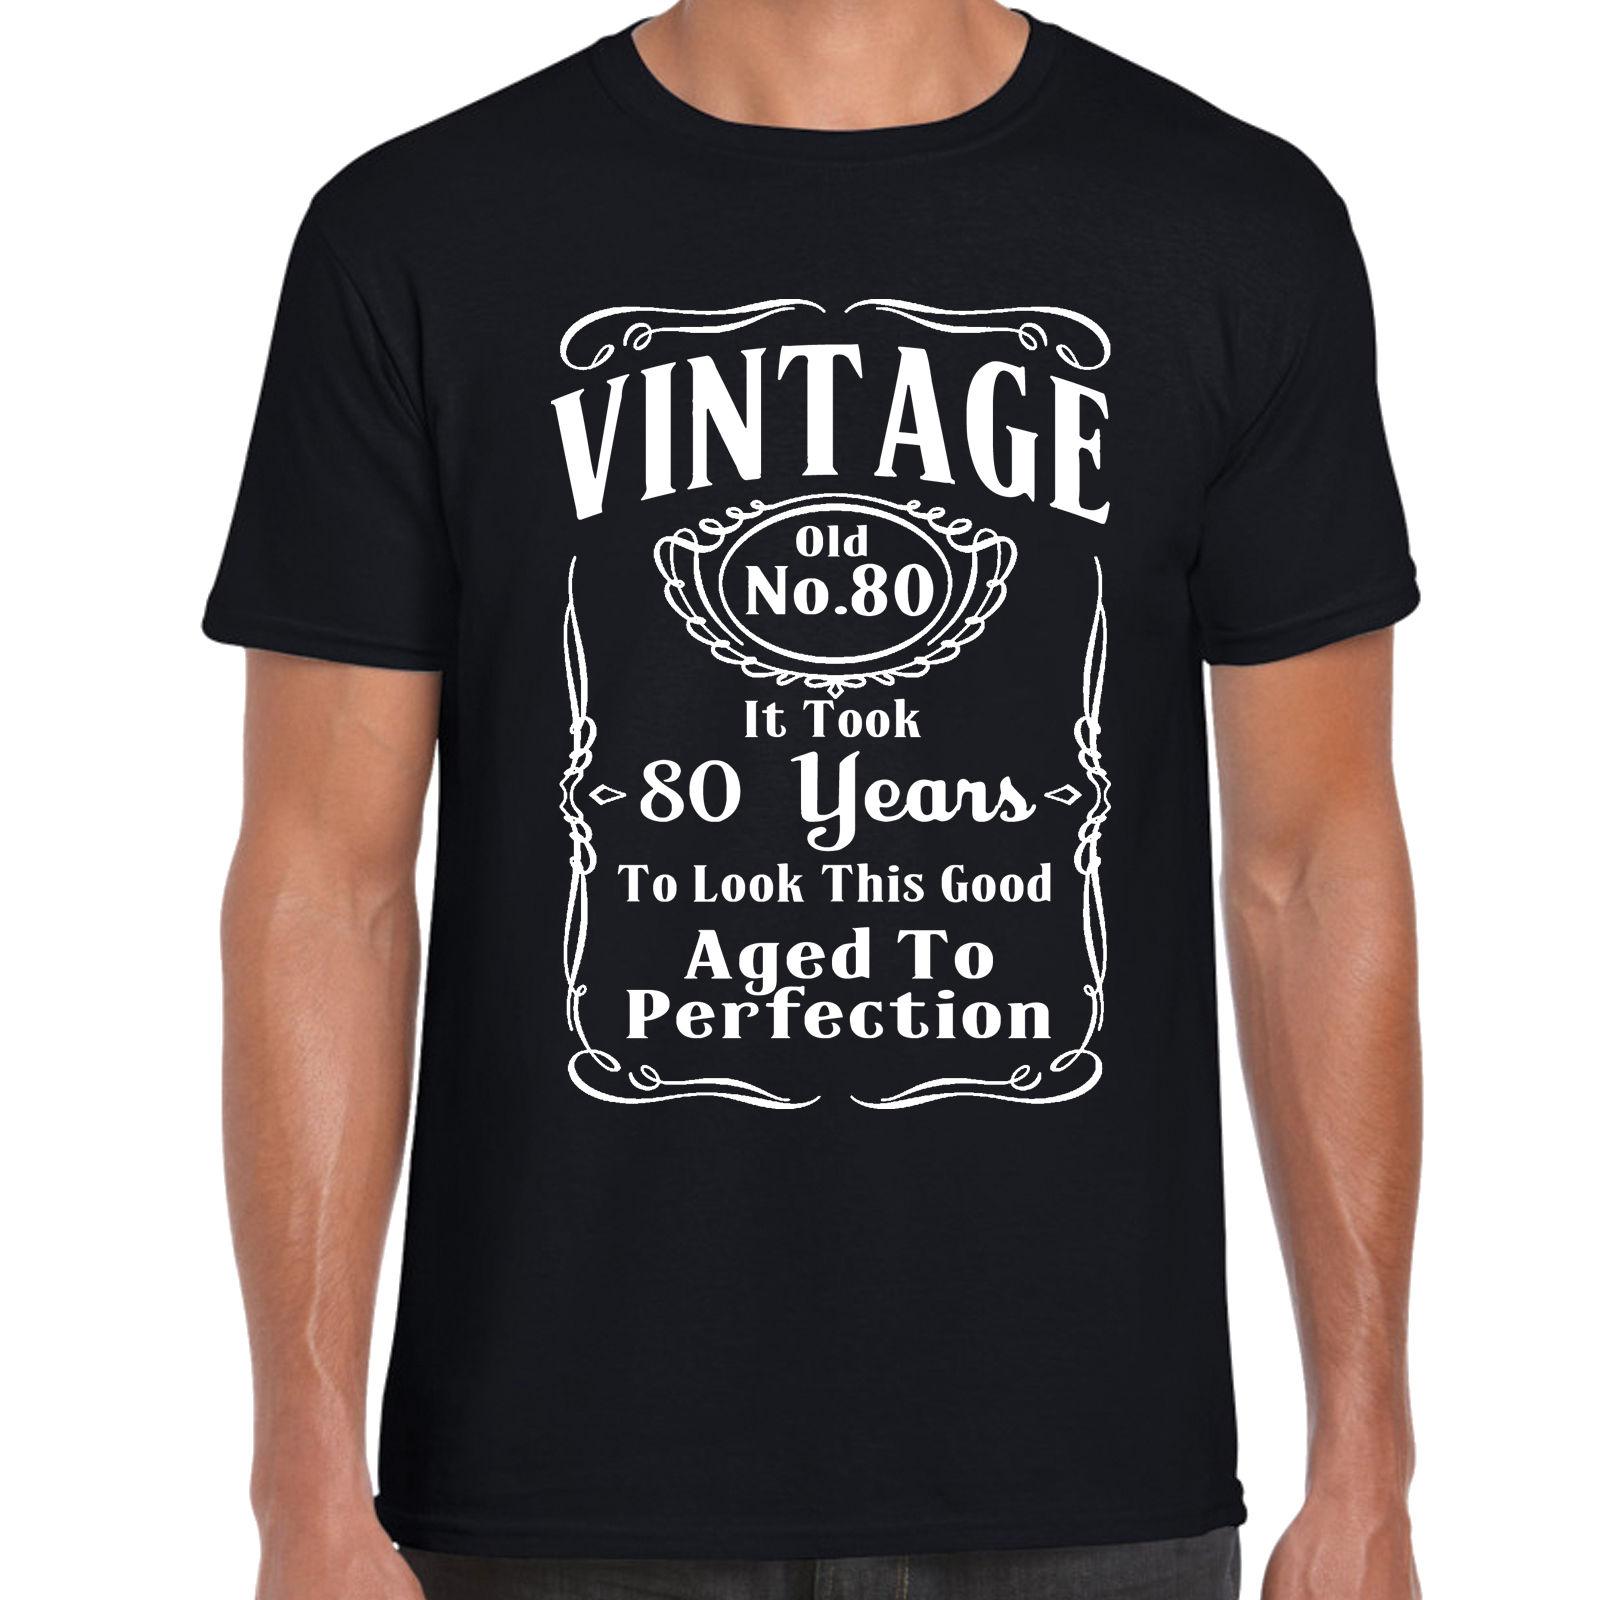 100% Cotton Fashion T Shirts Crew Neck Short-Sleeve Fashion Mens 80Th Birthday 80 Years Old Retirment Tees